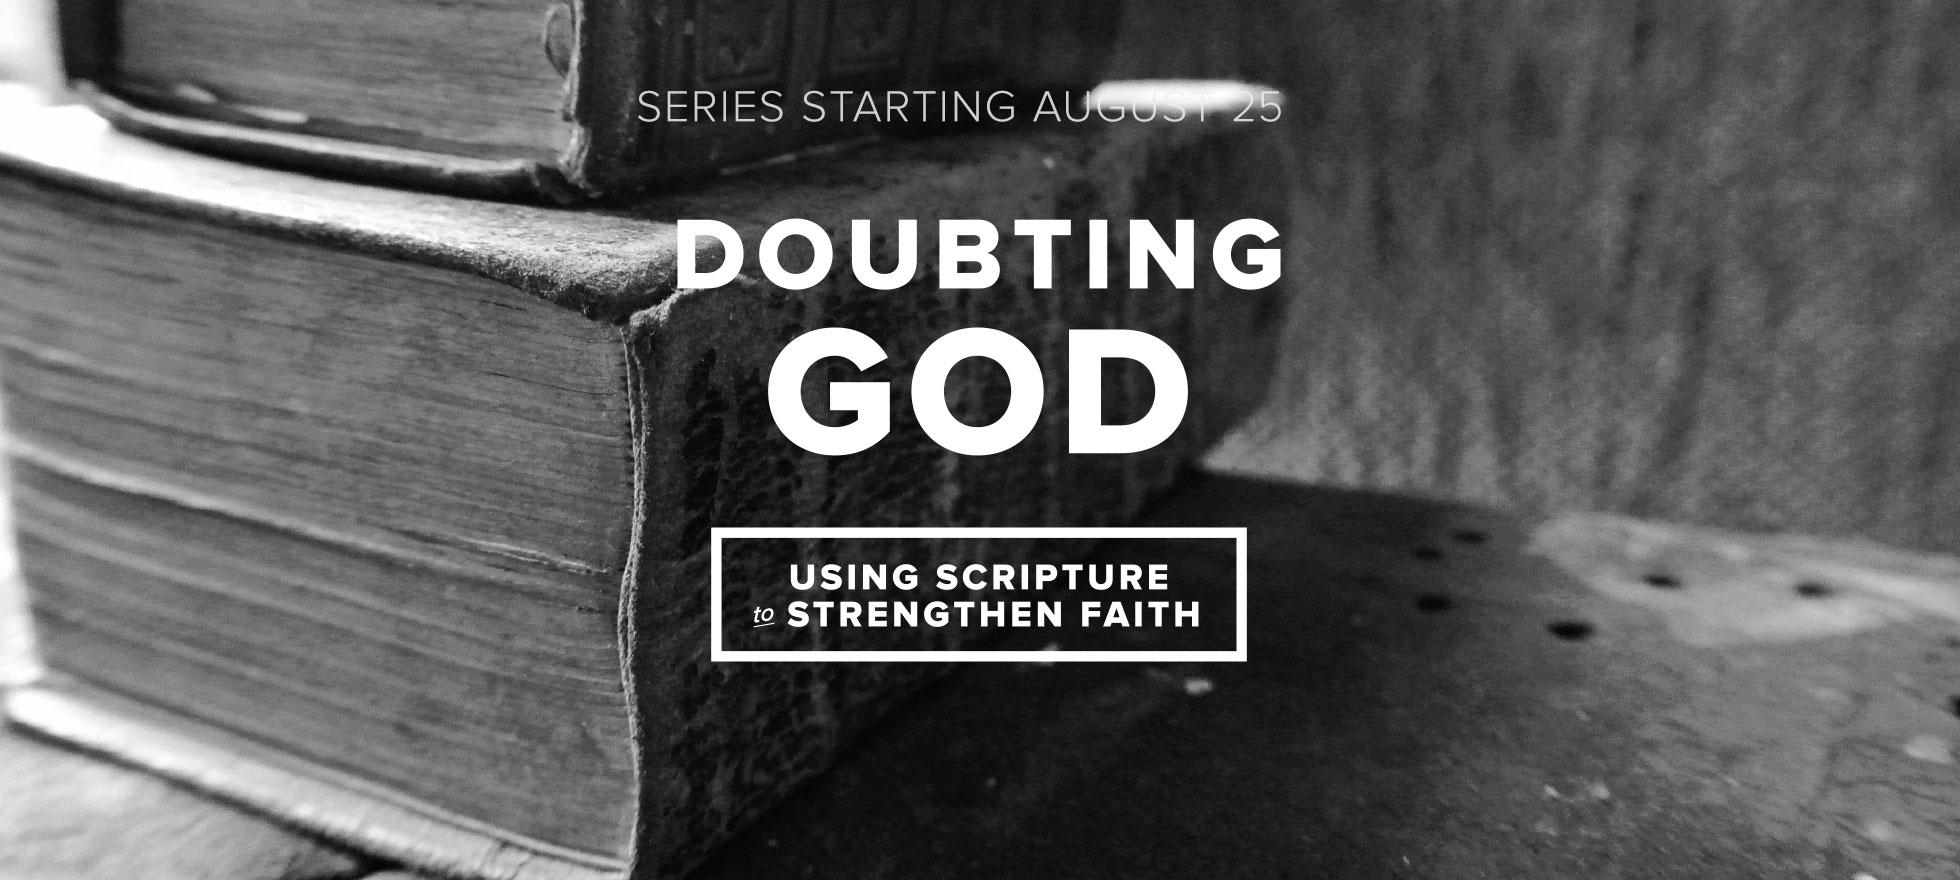 Doubting God image.jpg